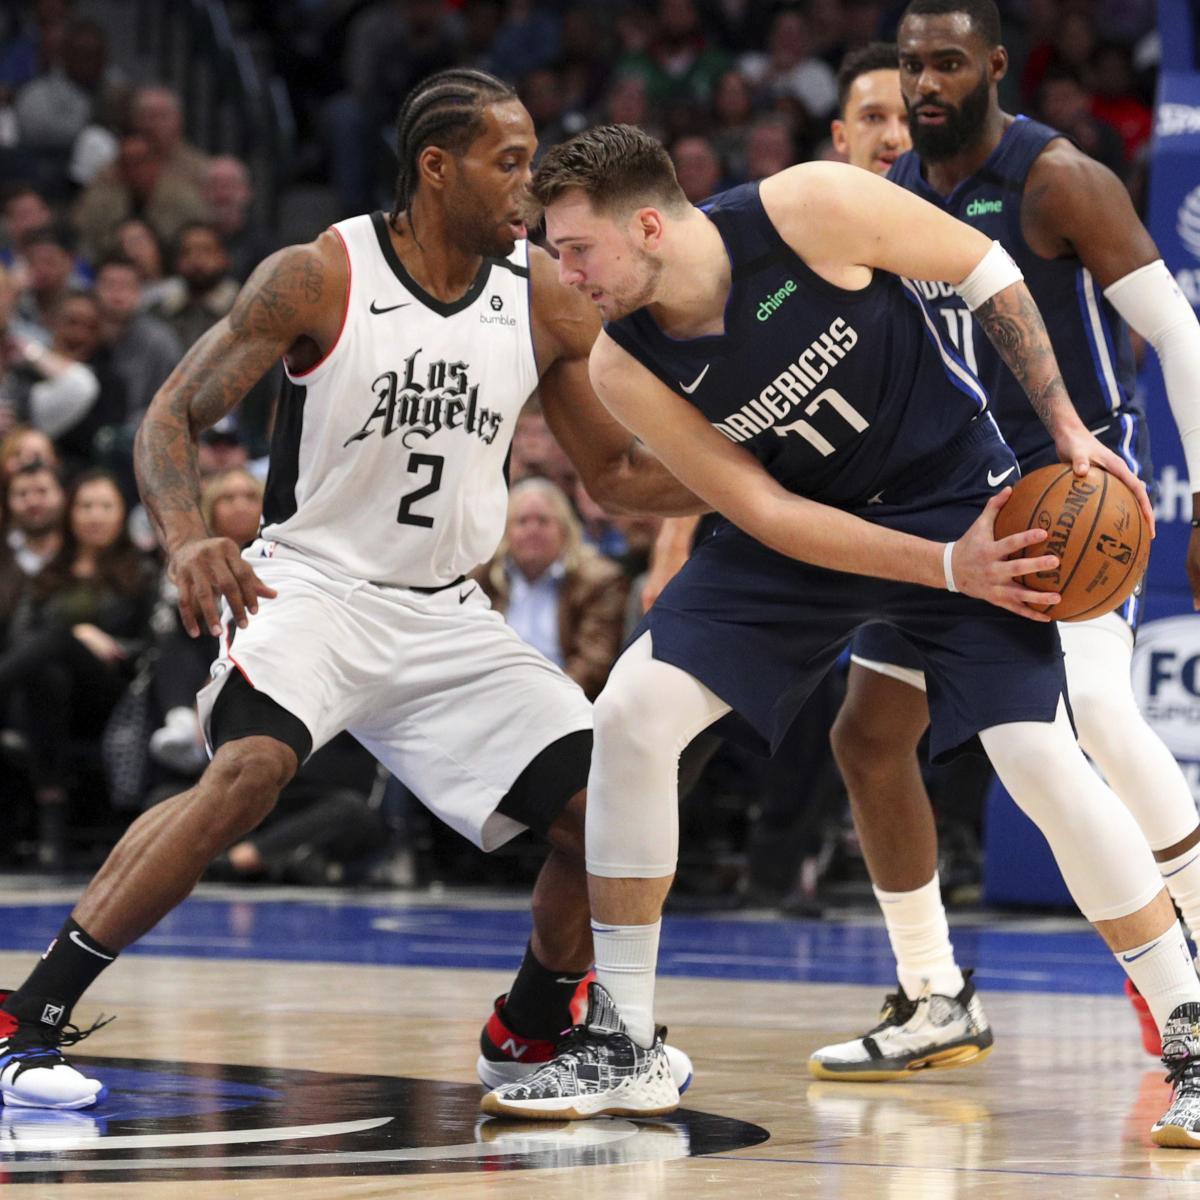 NBA Playoff Bracket 2020: Odds, TV Schedule, Live Stream, Predictions